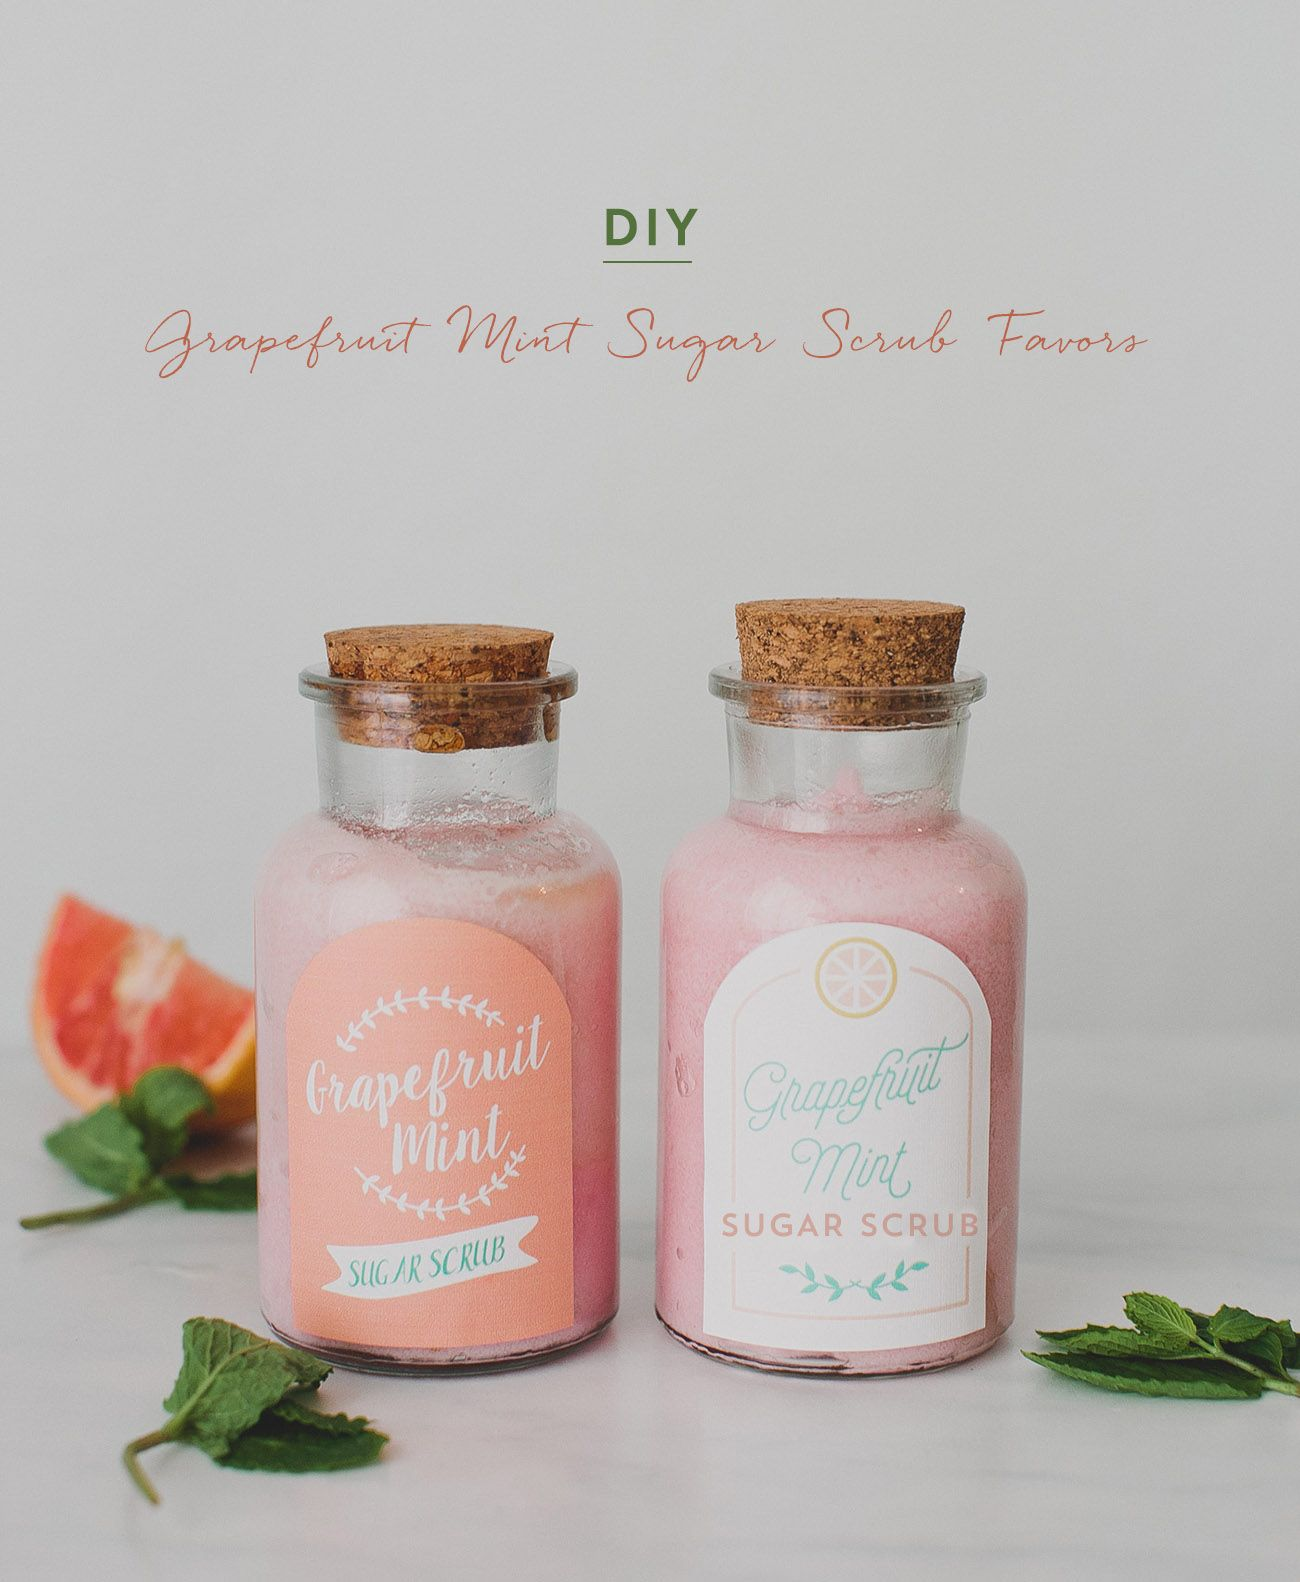 DIY Grapefruit Mint Sugar Scrub Favors | Grapefruit, Favors and Crafty